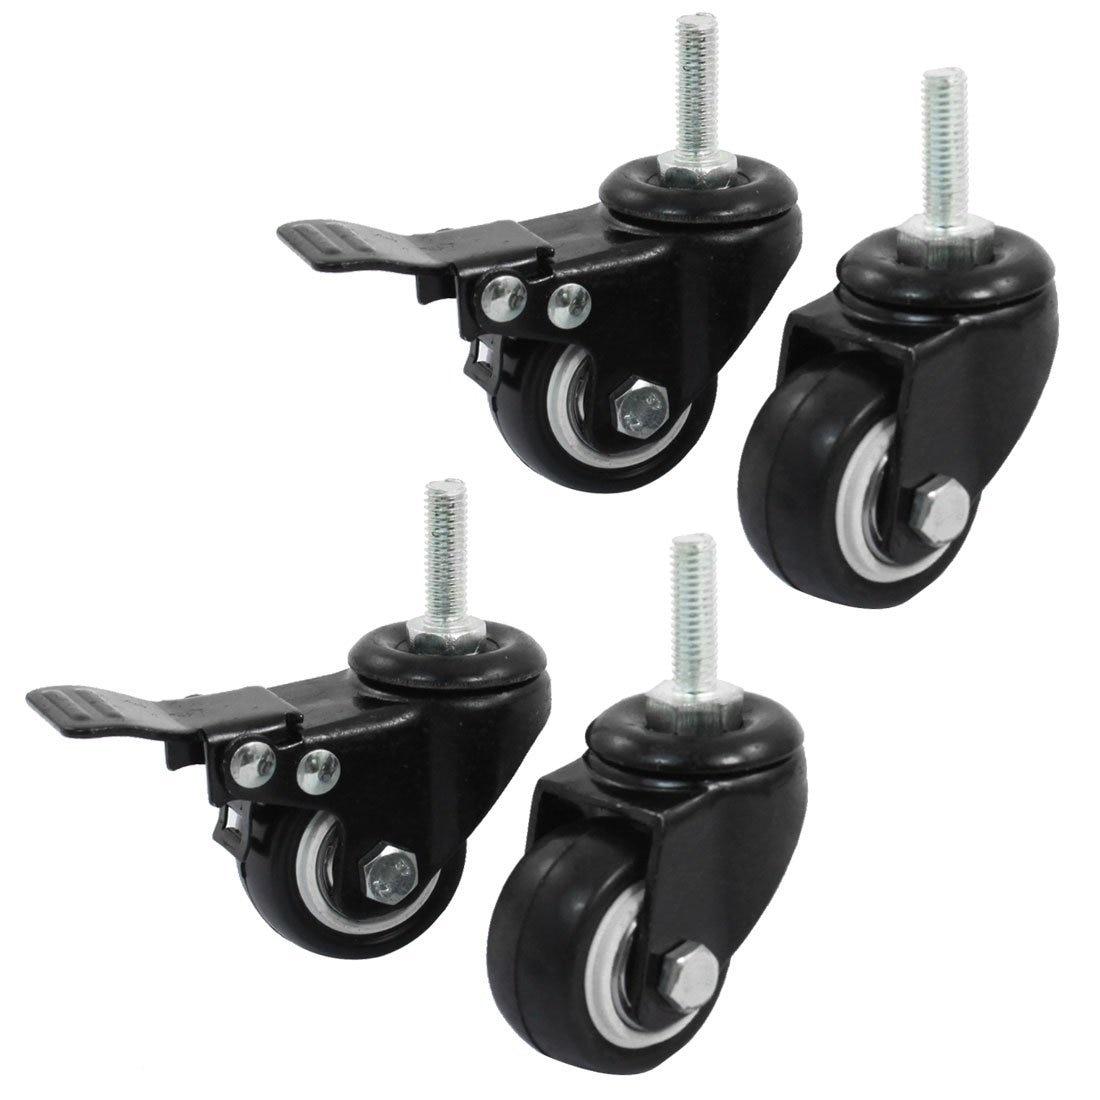 4pcs Shopping Wheel Trolley…